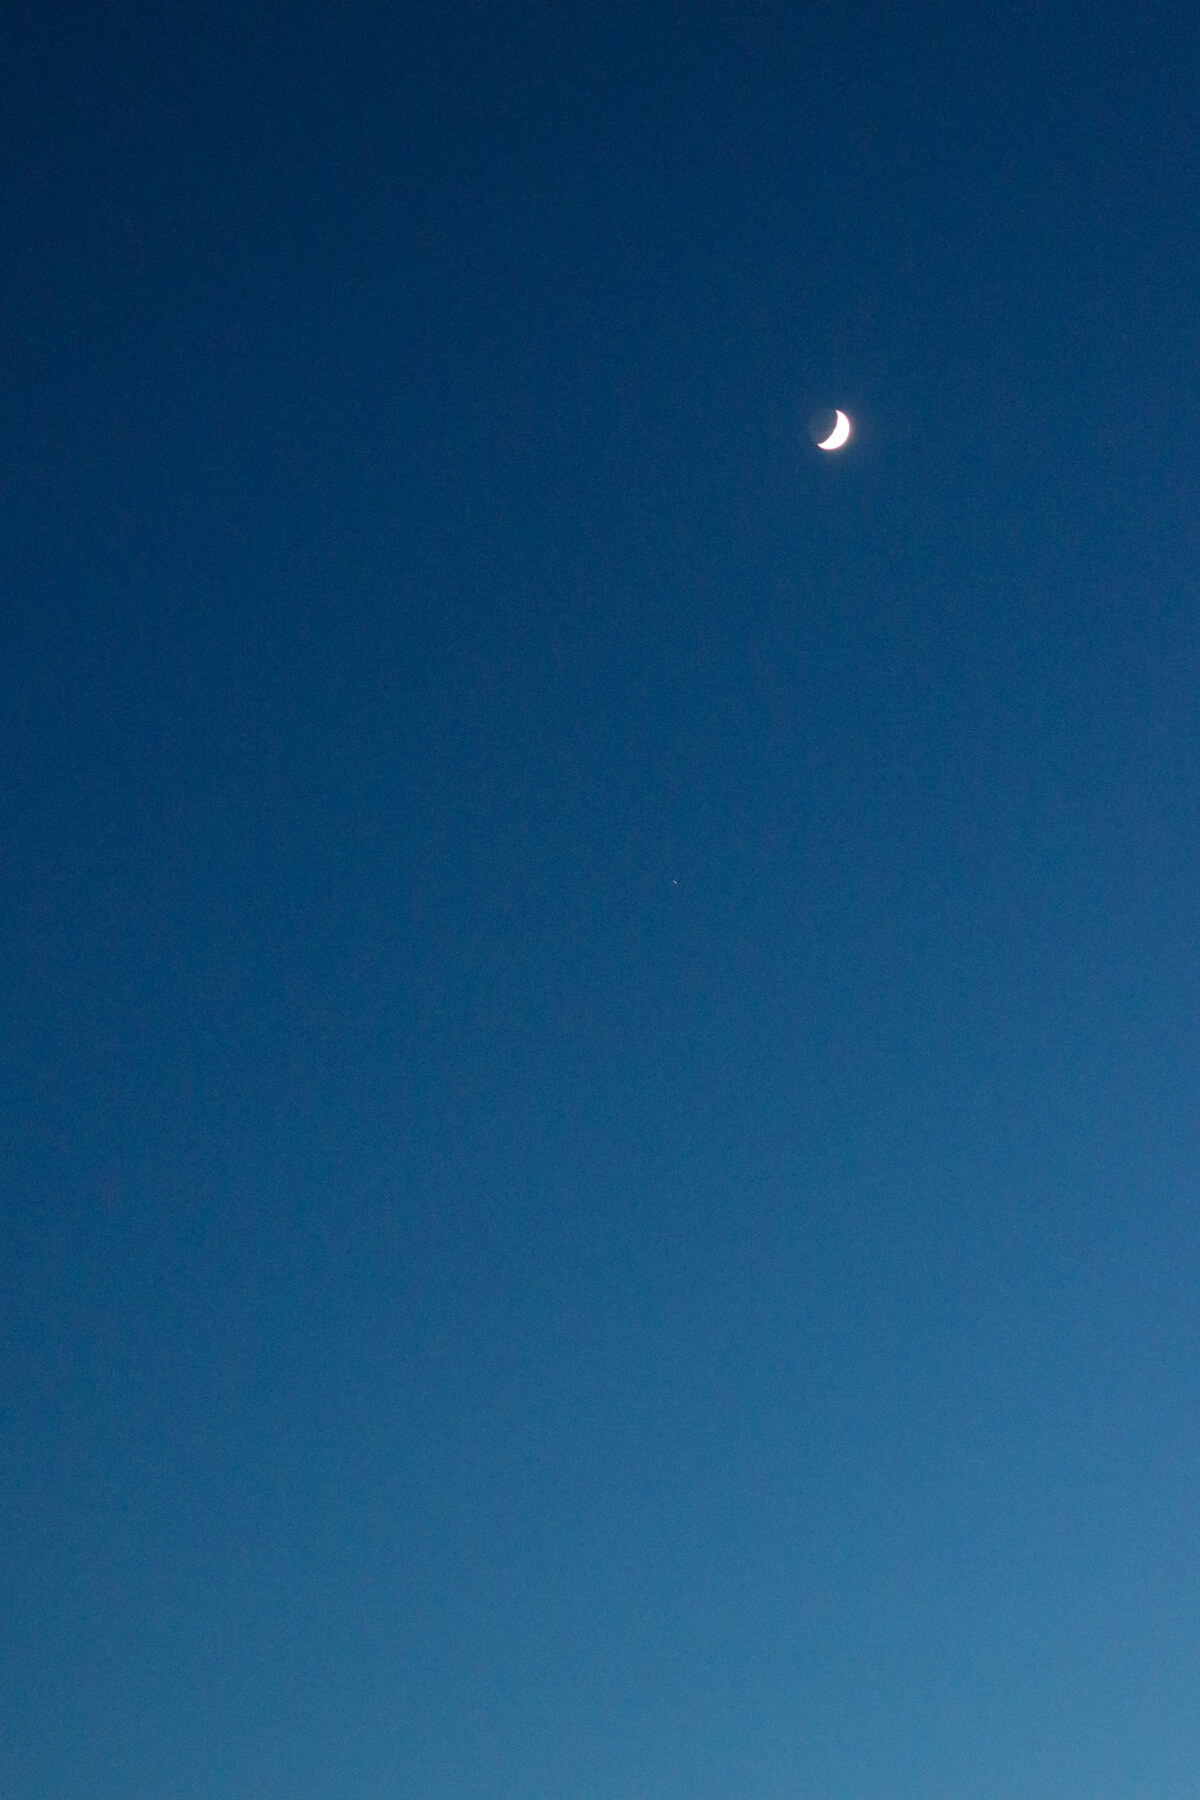 Summer Moon, Indiatlantic Beach, Florida